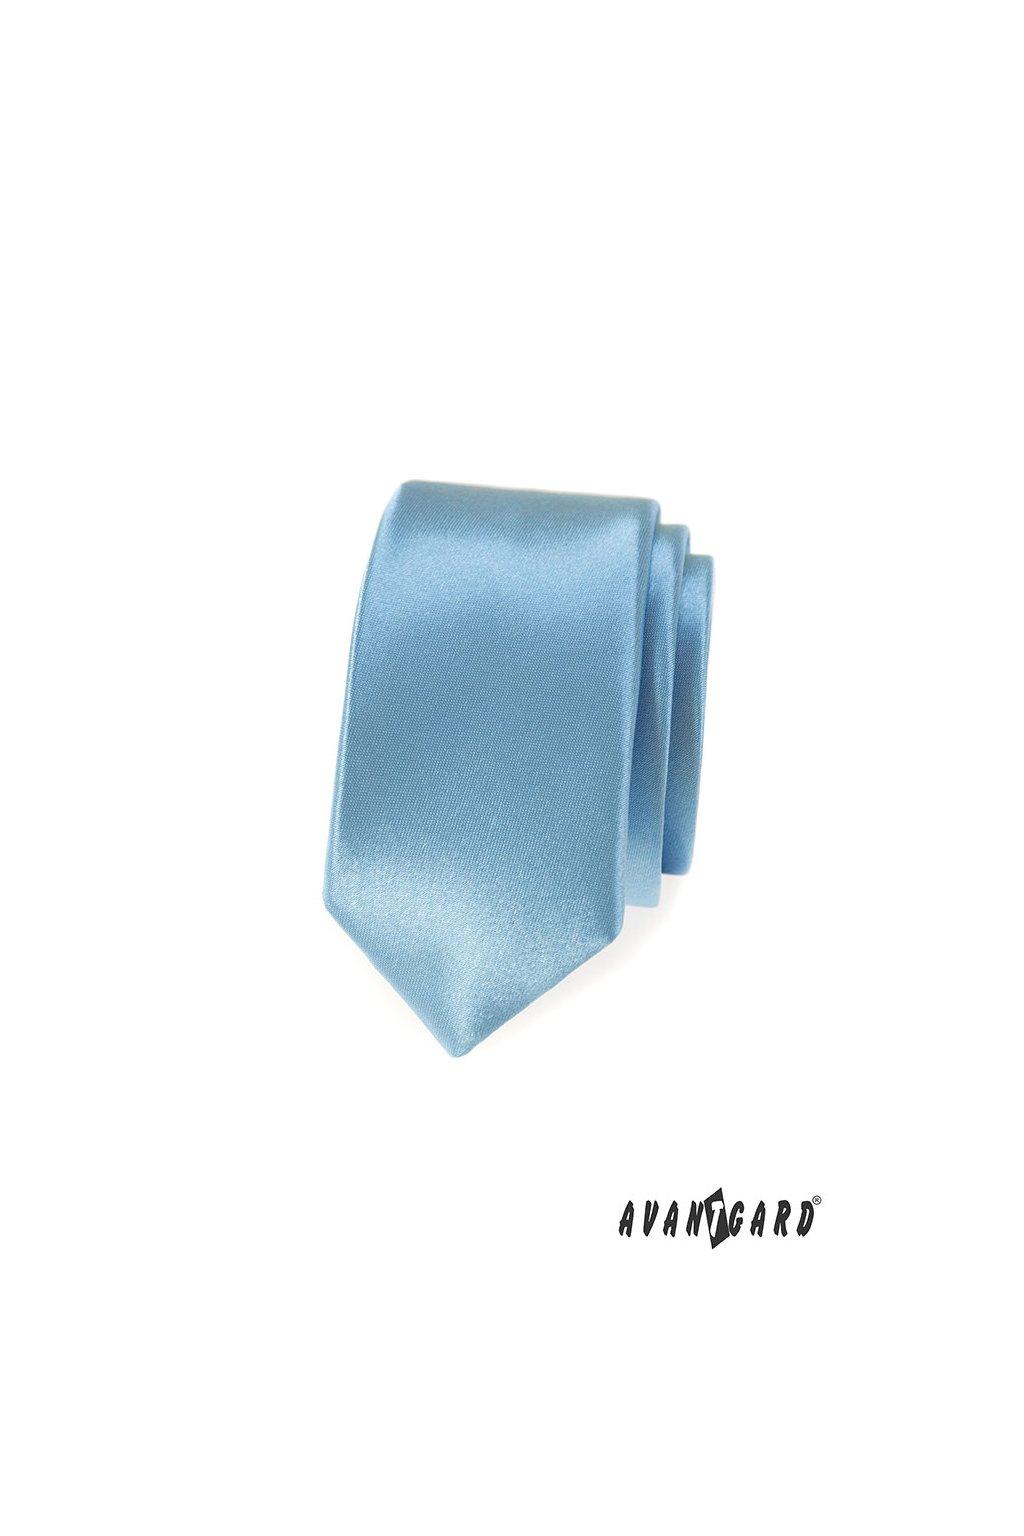 Kravata SLIM LUX modrá 571 - 9014